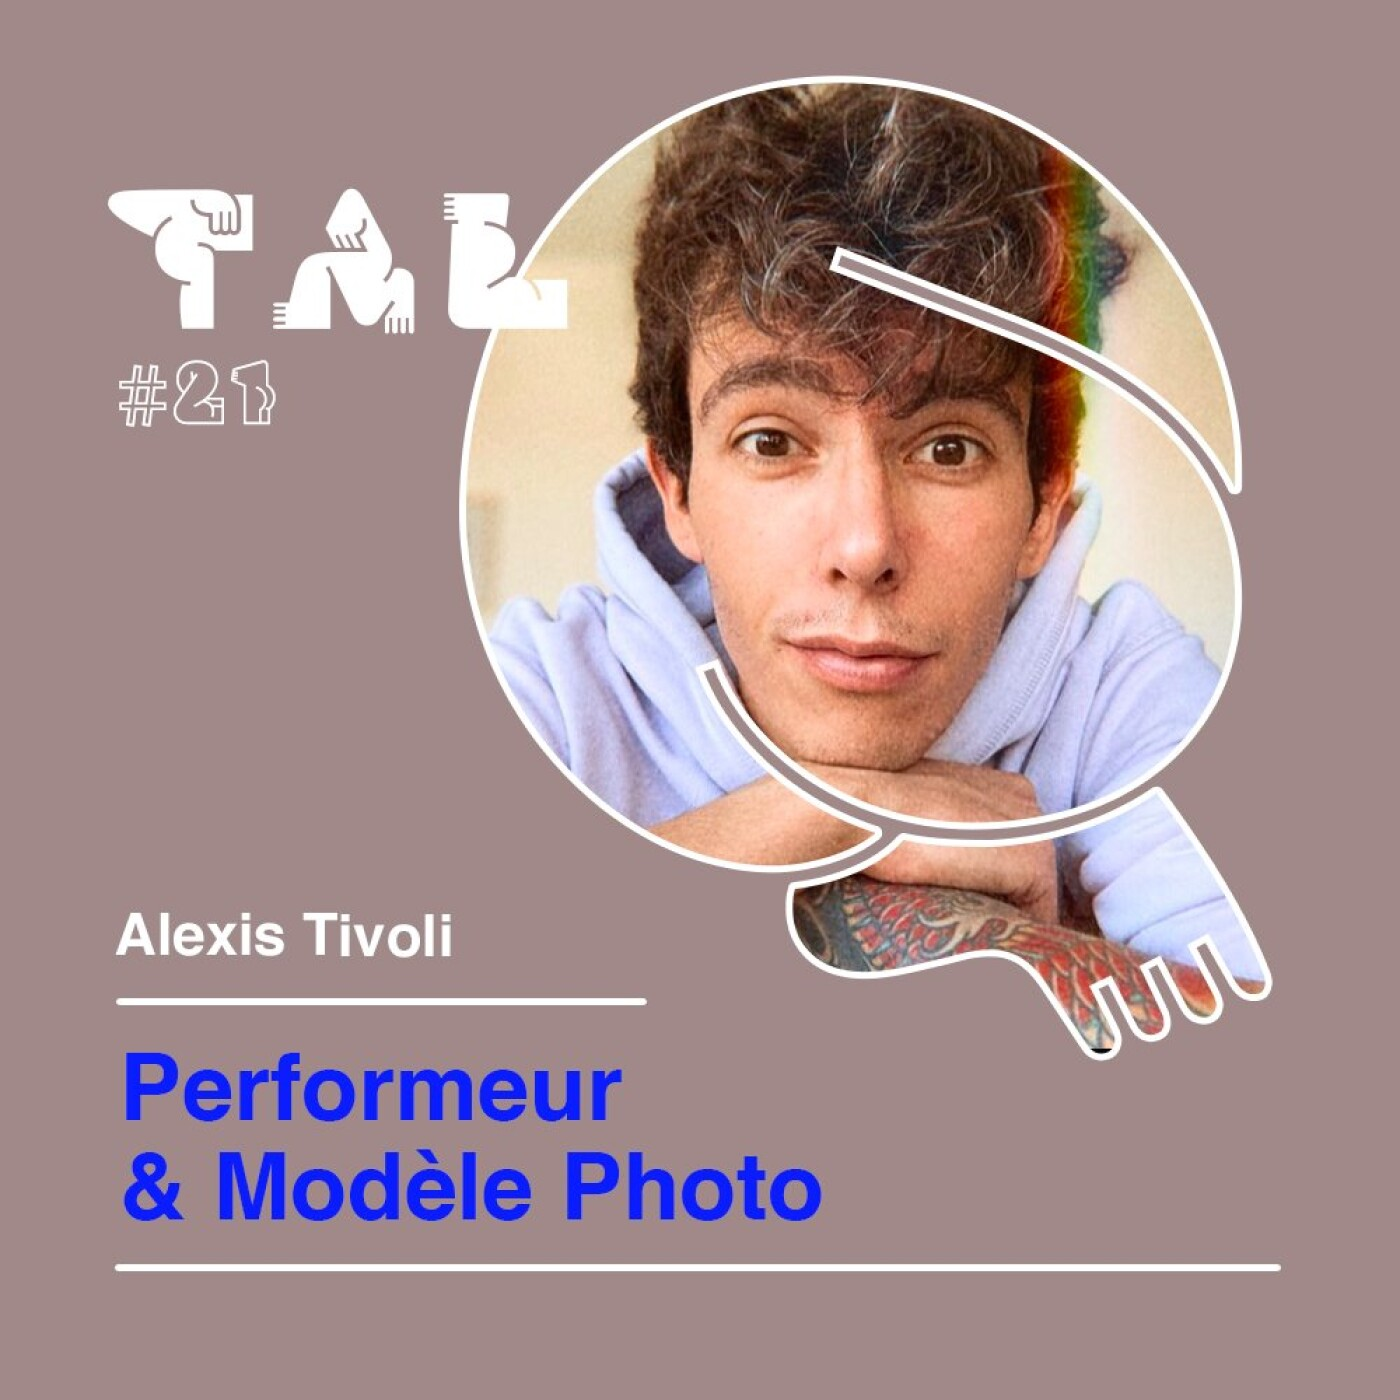 #21 - Alexis Tivoli : Performeur & Modèle Photo